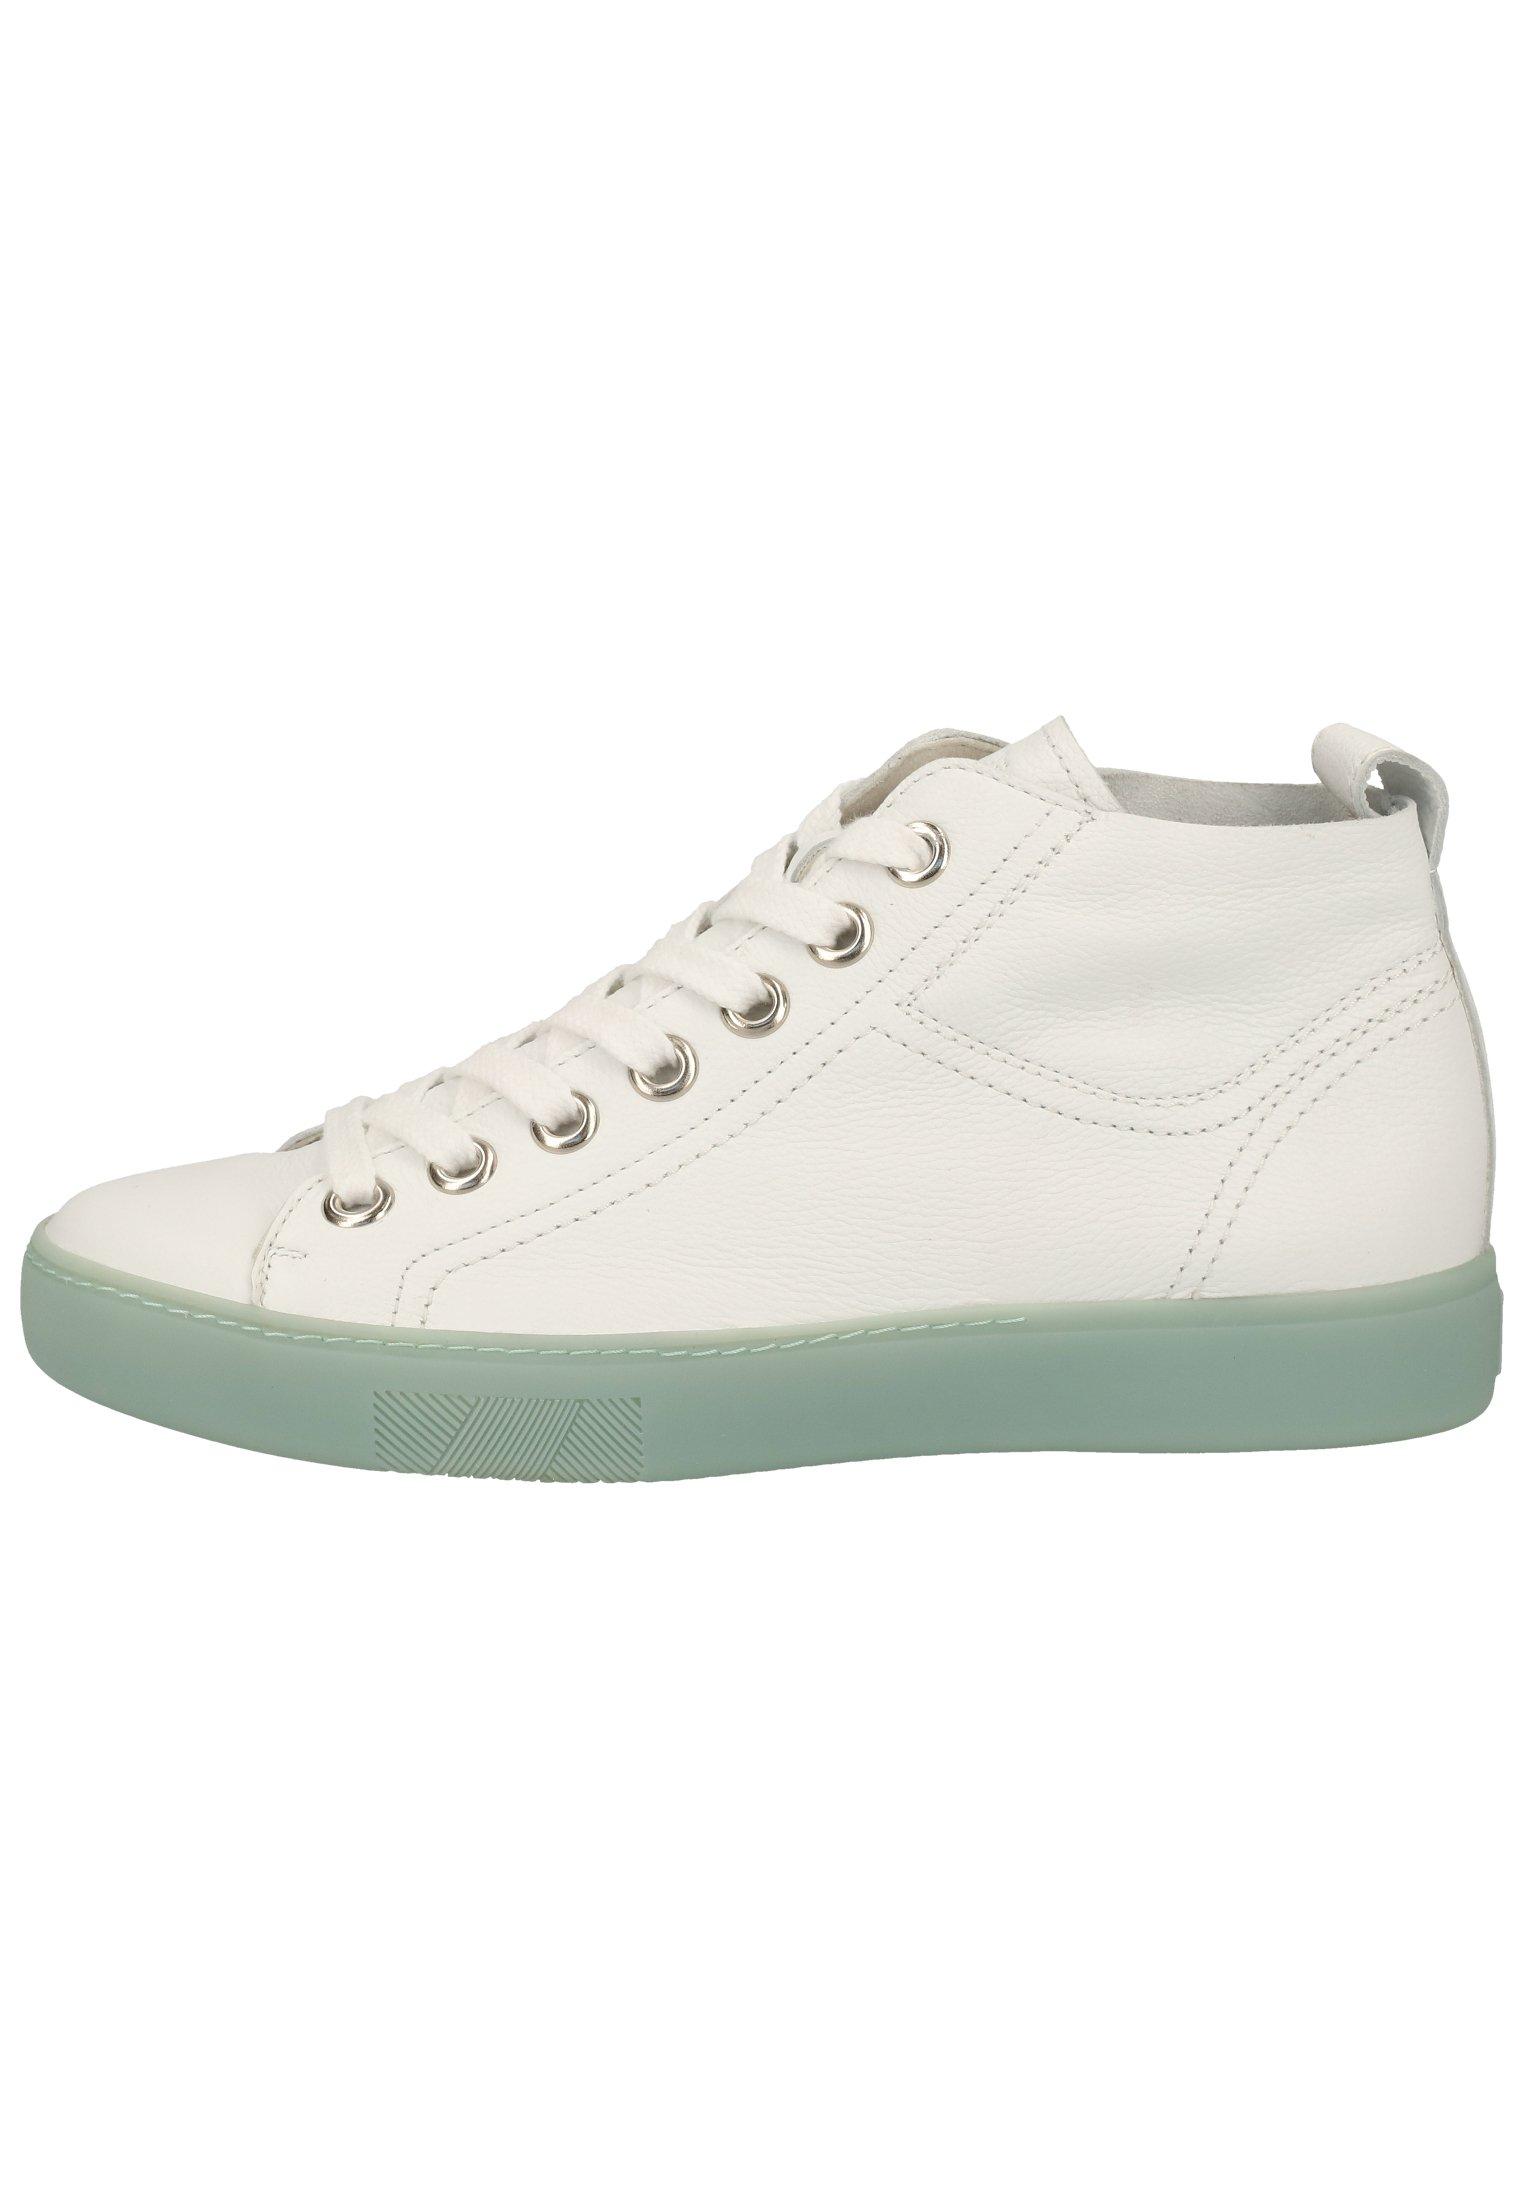 Sneaker high whitemint